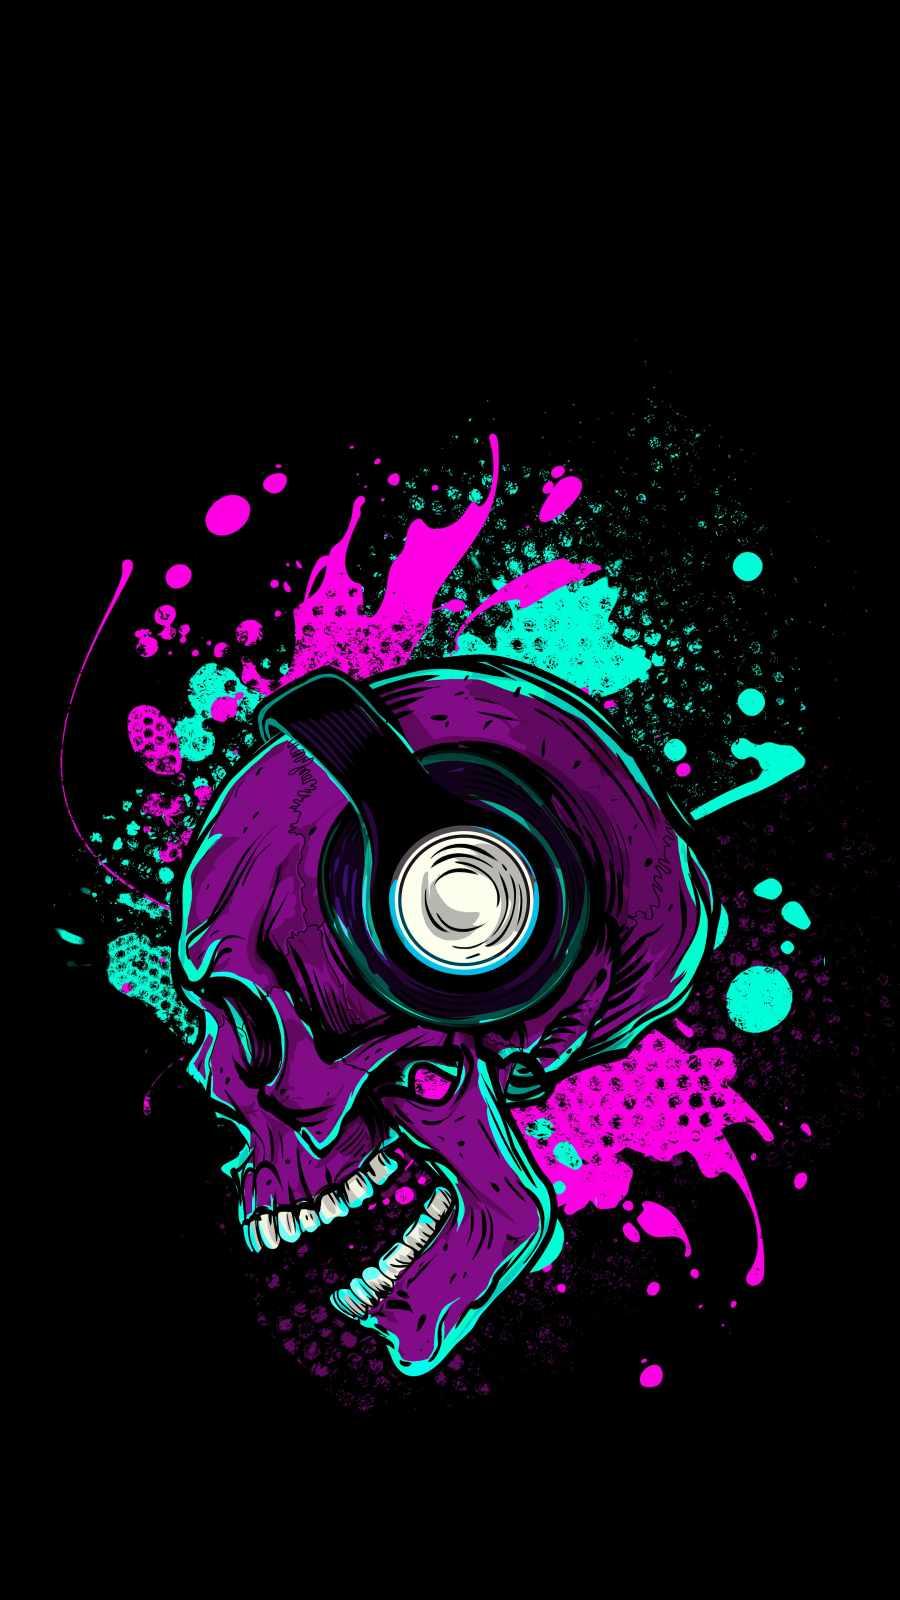 Music Skull iPhone Wallpaper